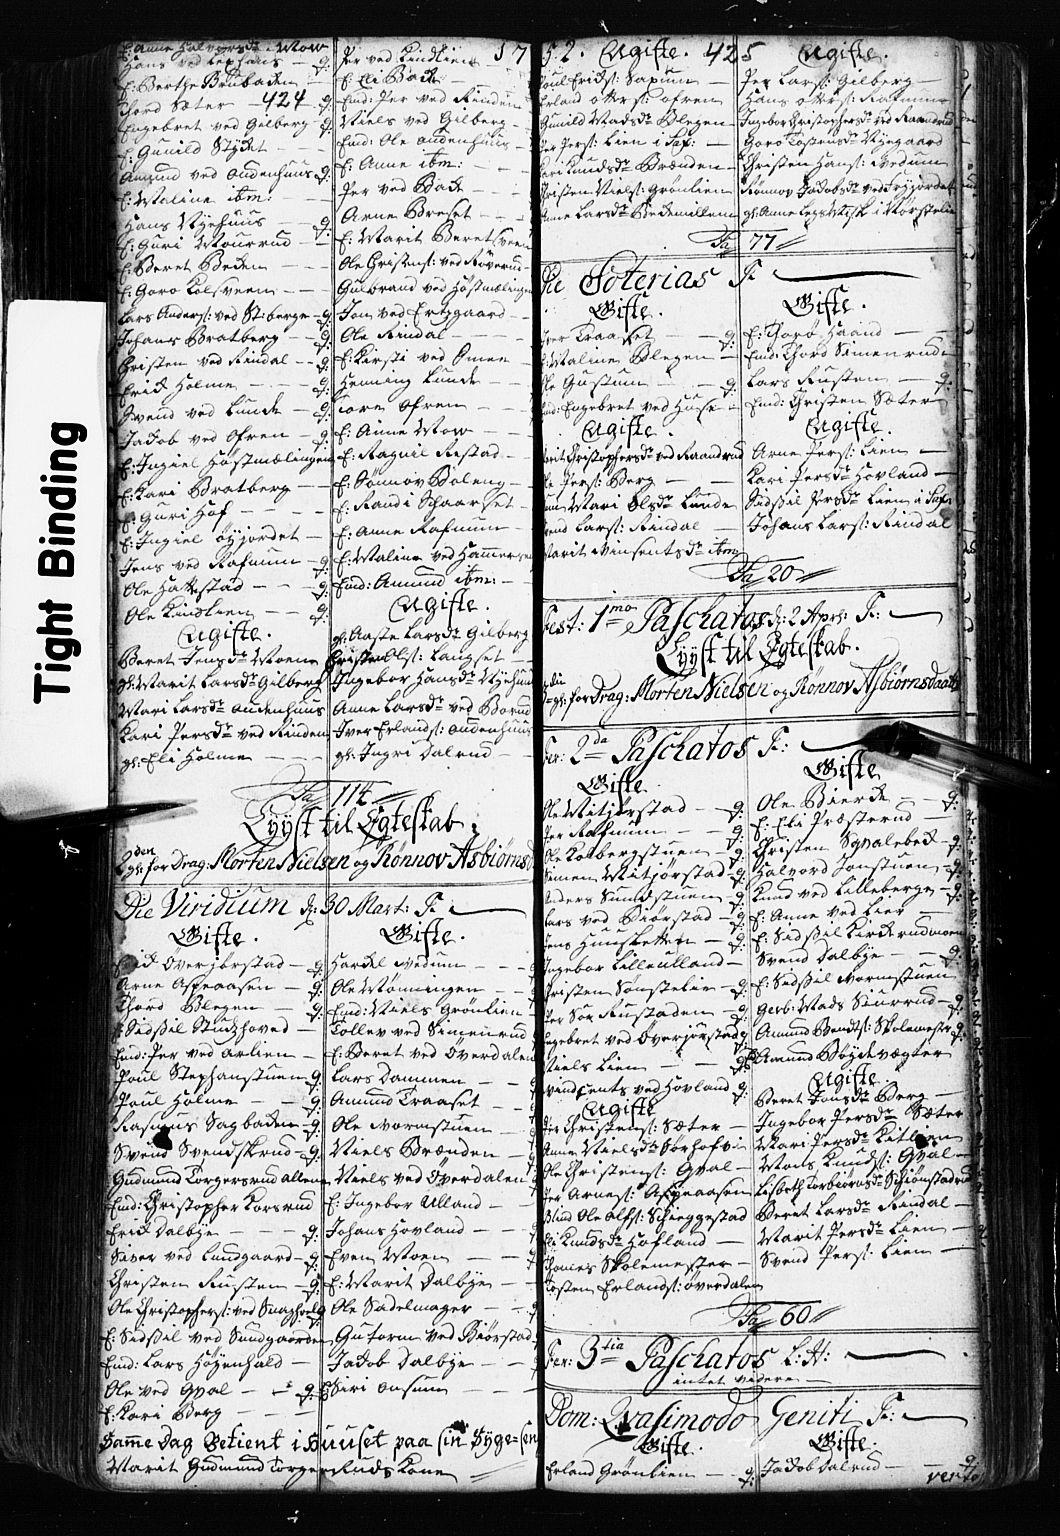 SAH, Fåberg prestekontor, Klokkerbok nr. 2, 1741-1756, s. 424-425